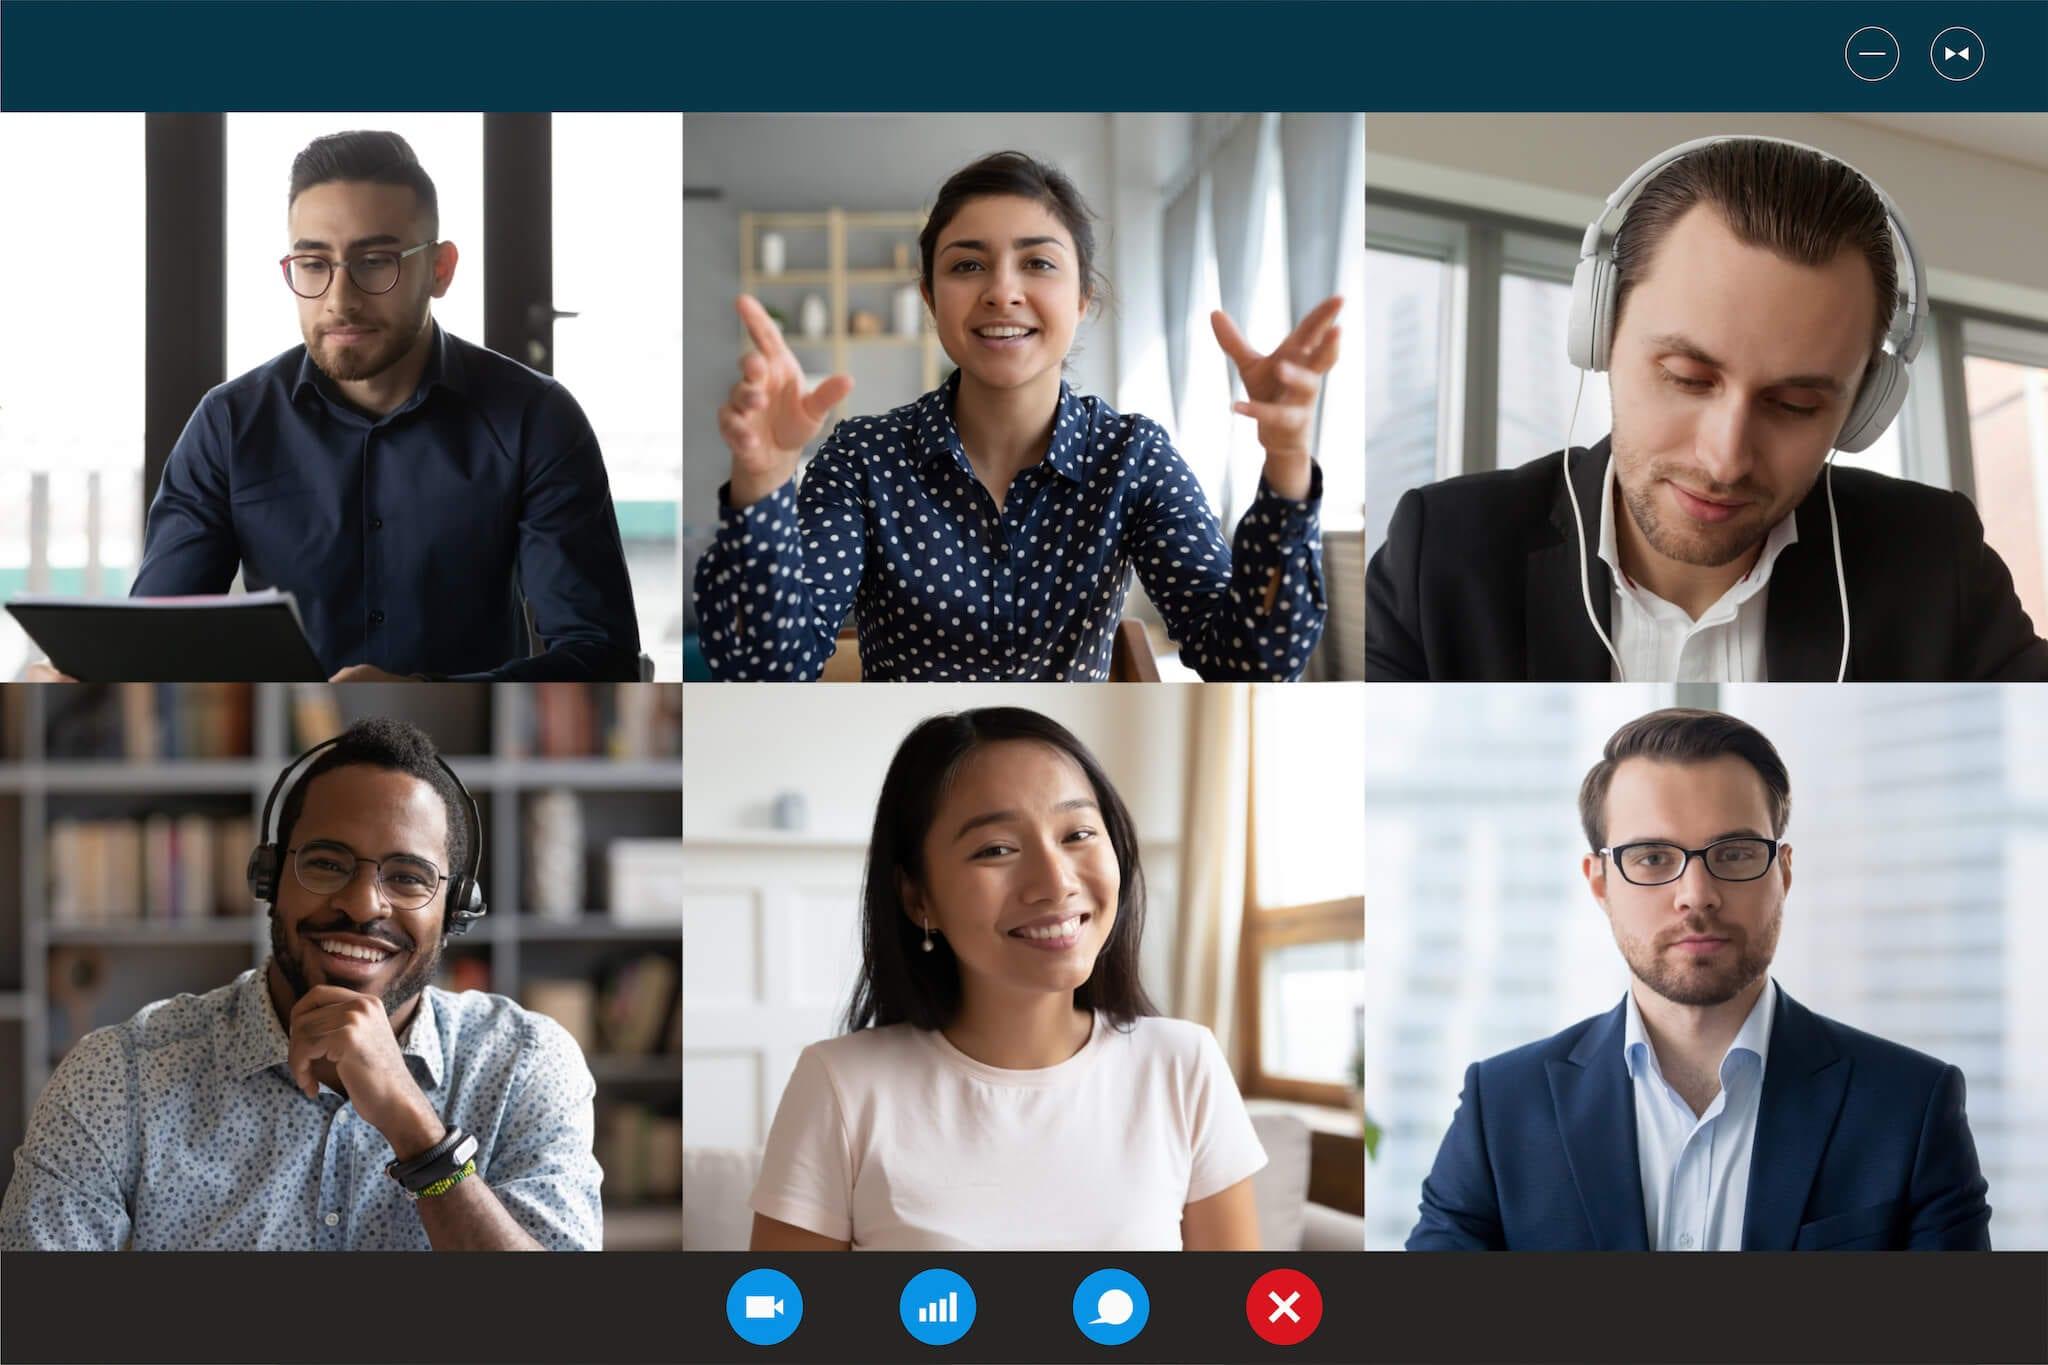 Ai, Bots And Contextual Communication The Future Of Enterprise Communications